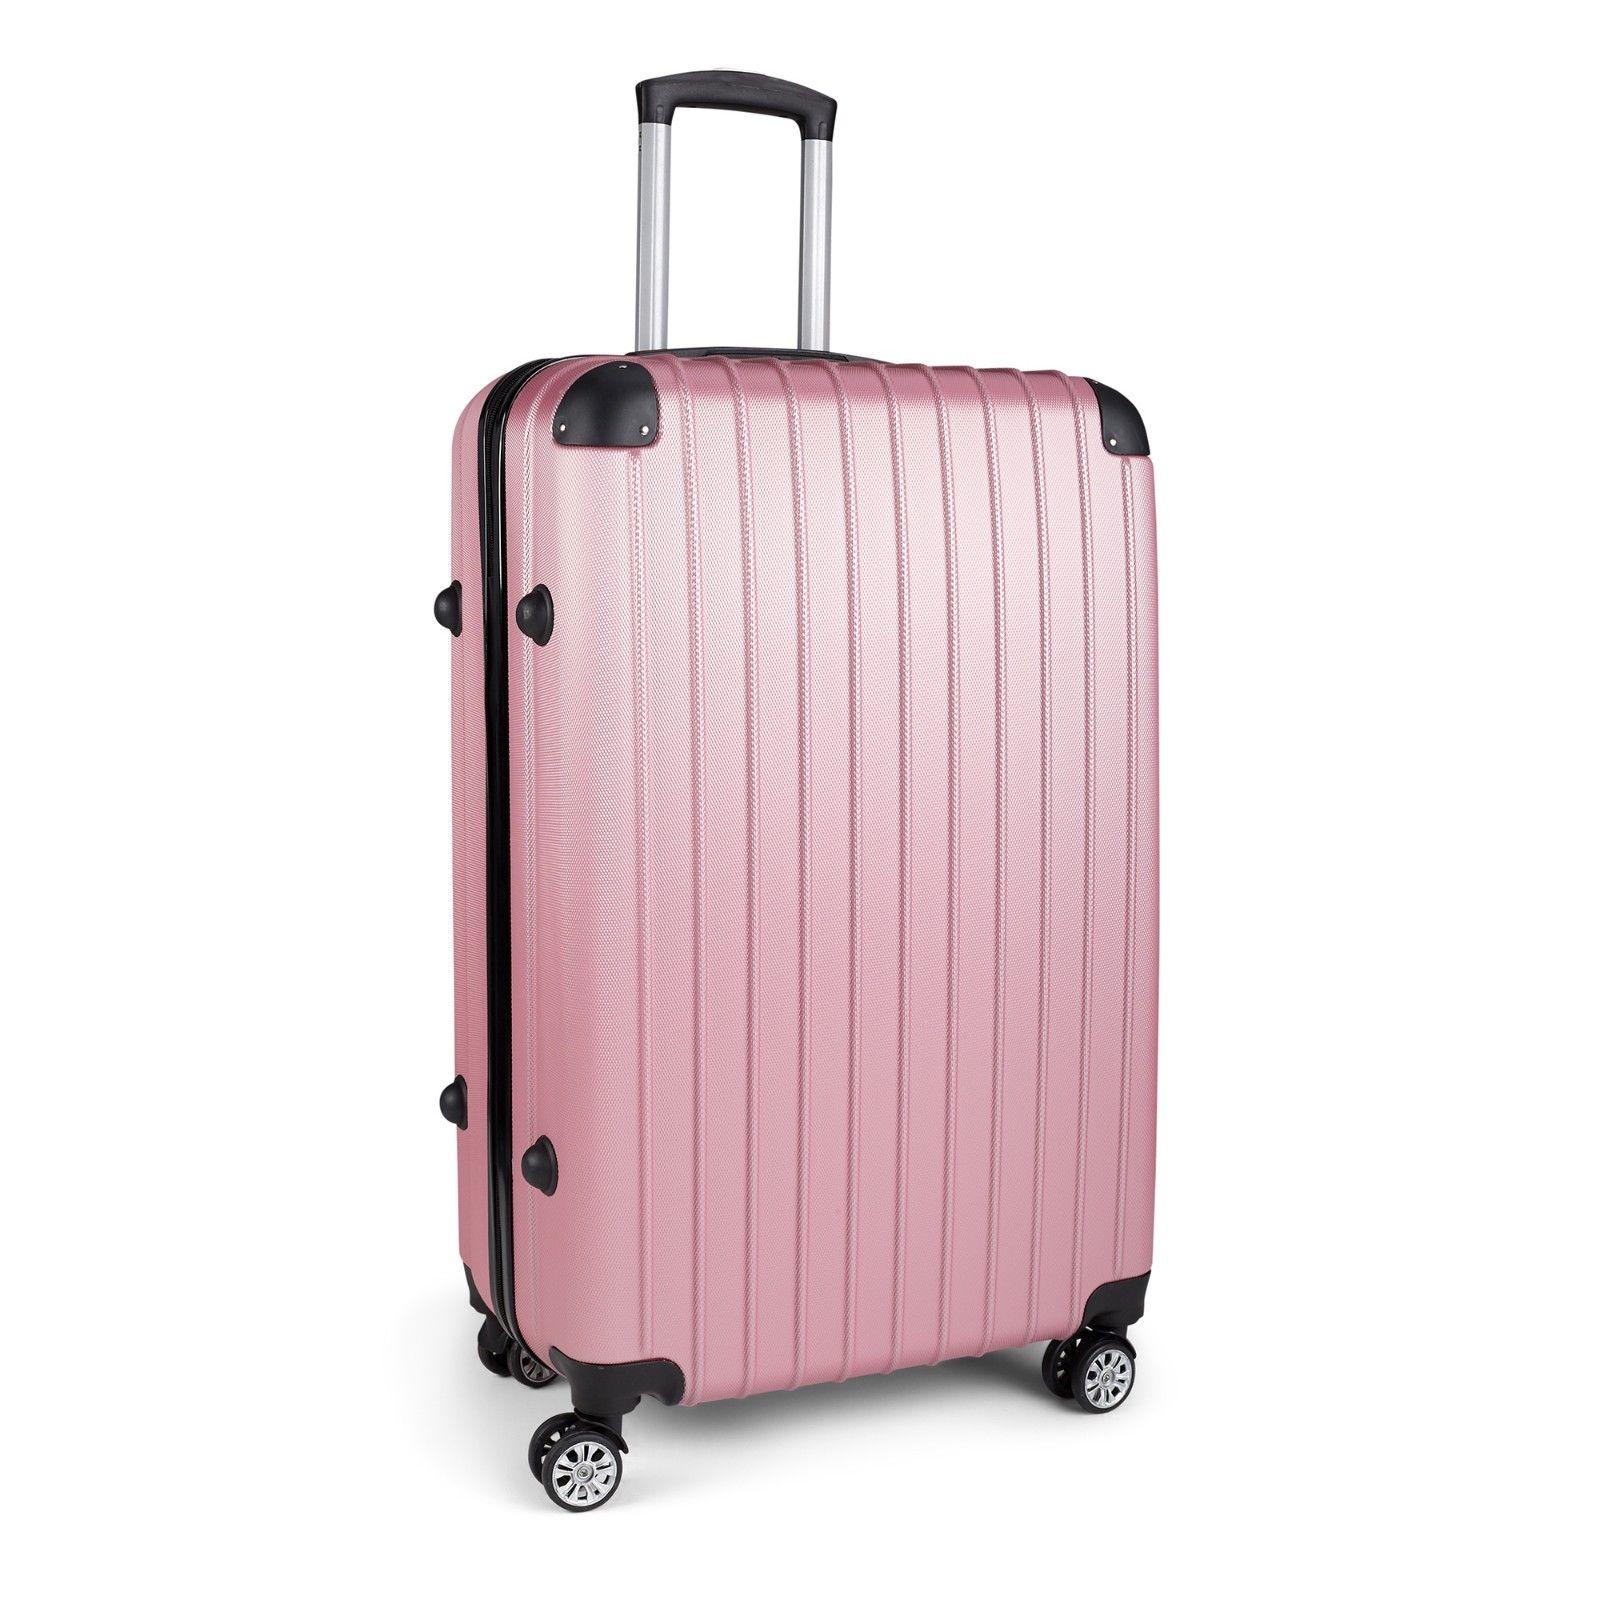 Milano-Premium-3pc-ABS-Luggage-Suitcase-Luxury-Hard-Case-Shockproof-Travel-Set thumbnail 24